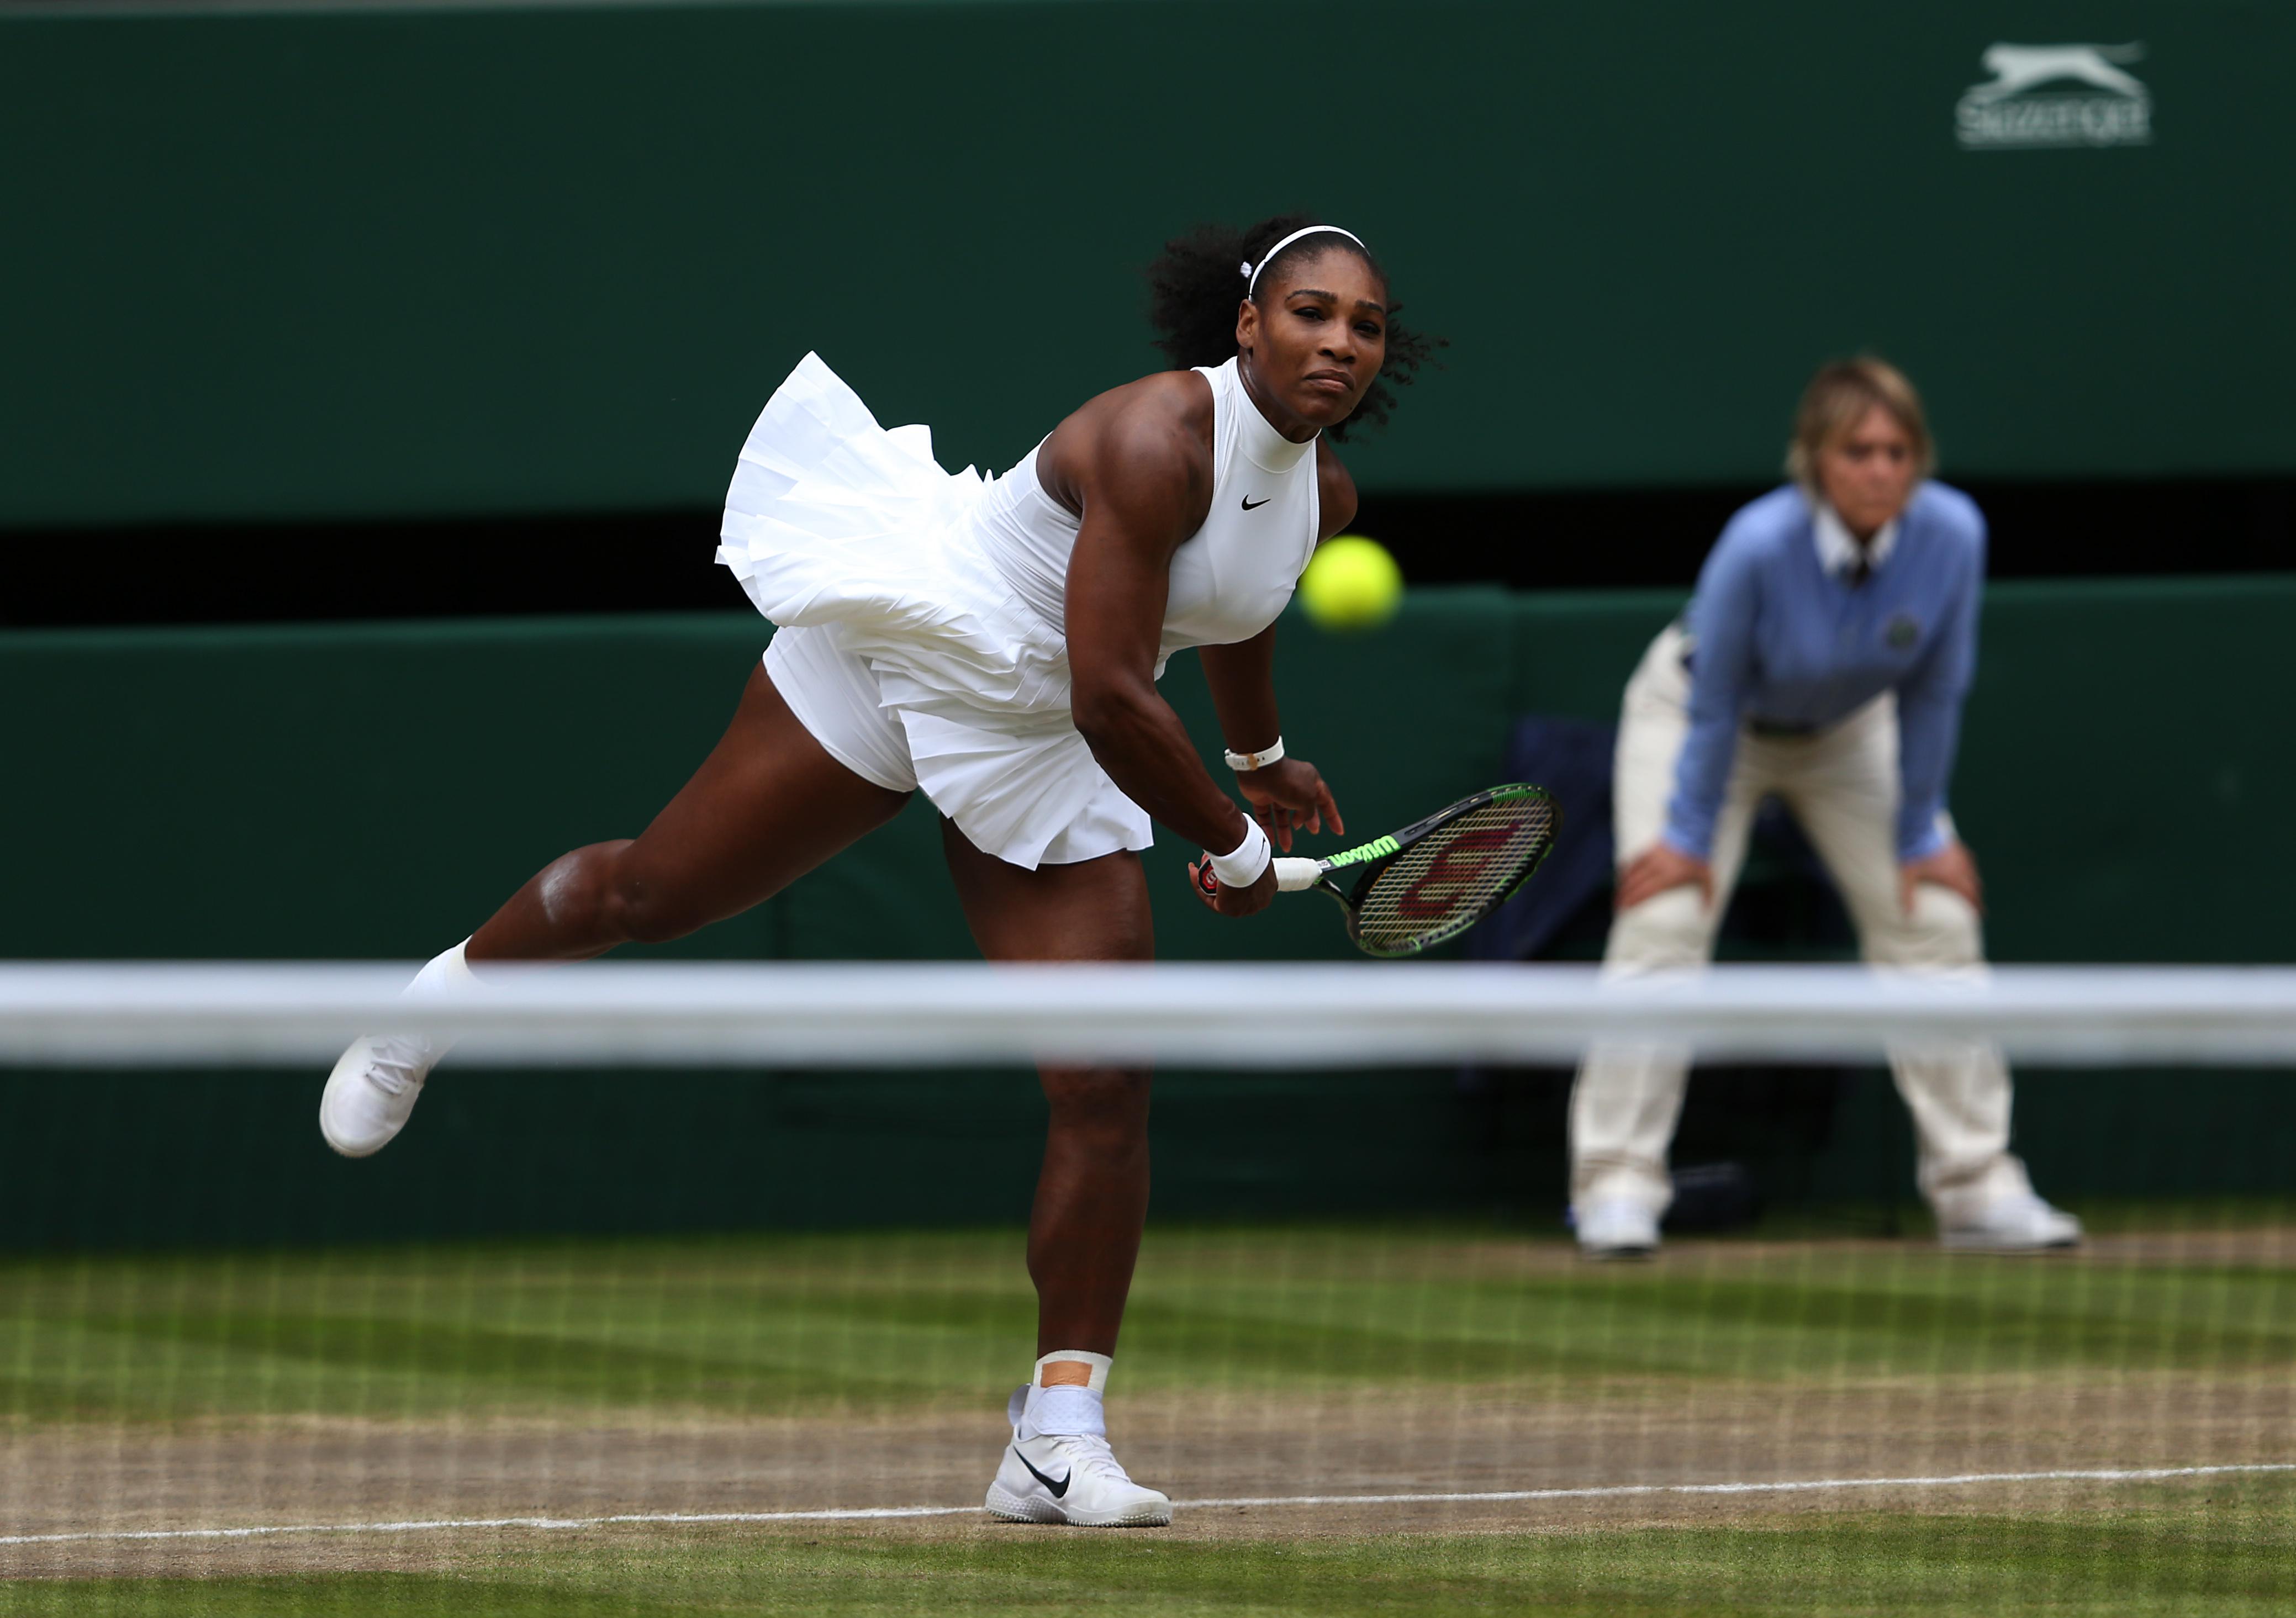 Wimbledon 2018 Top Female Tennis Players